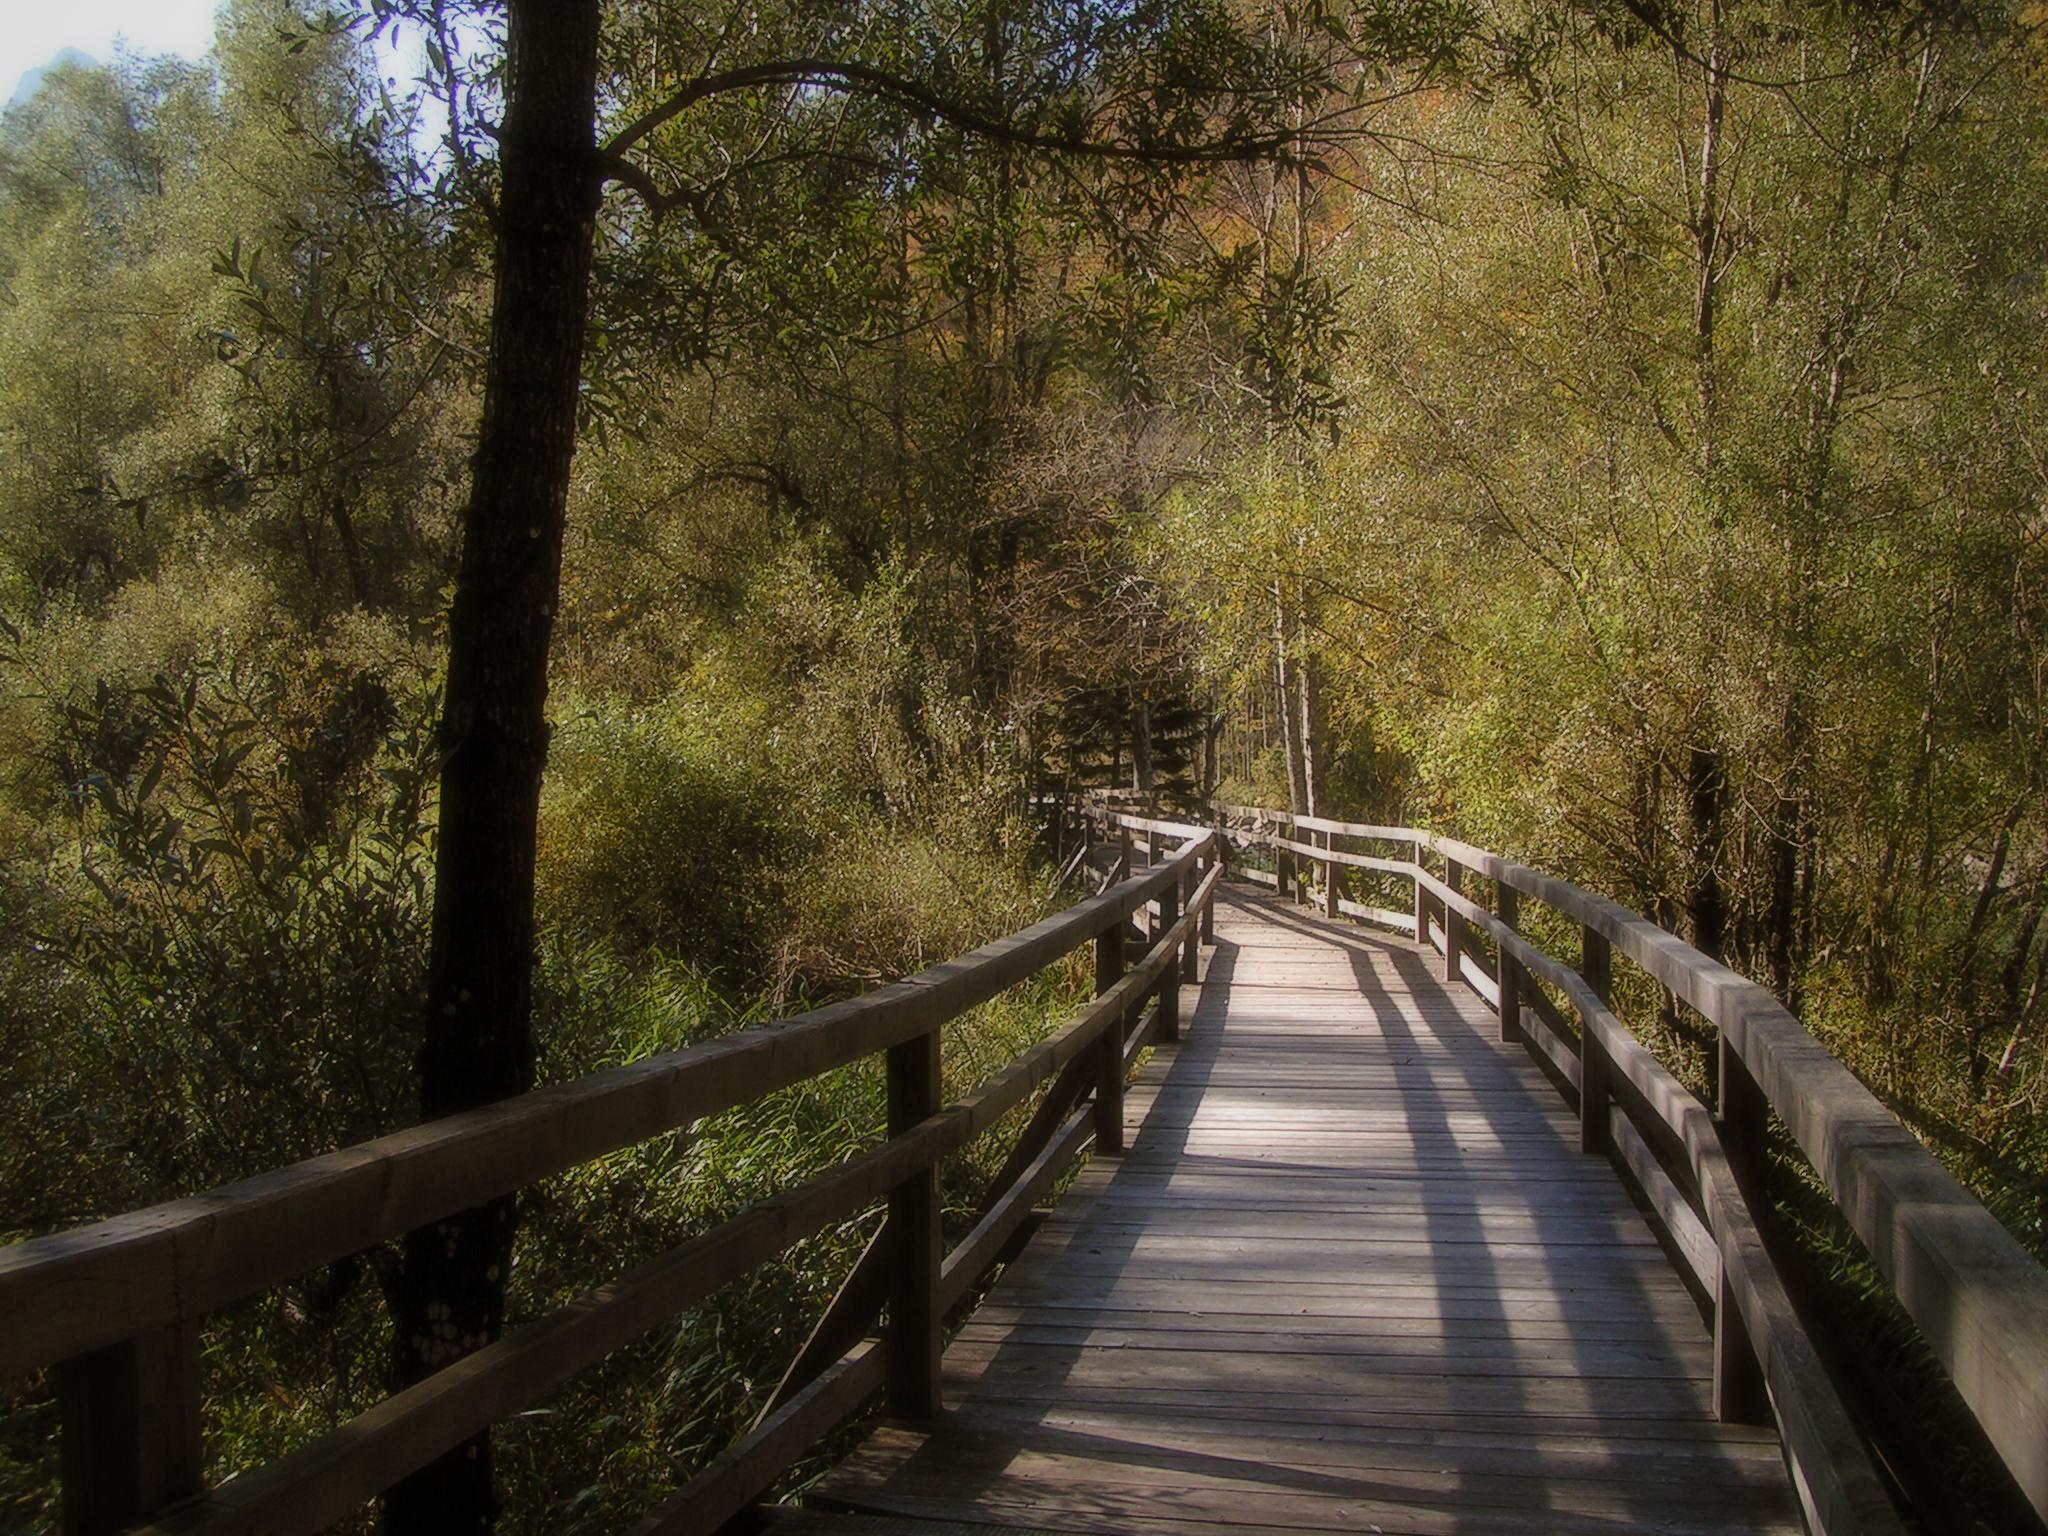 Bridge by darkrose42-stock